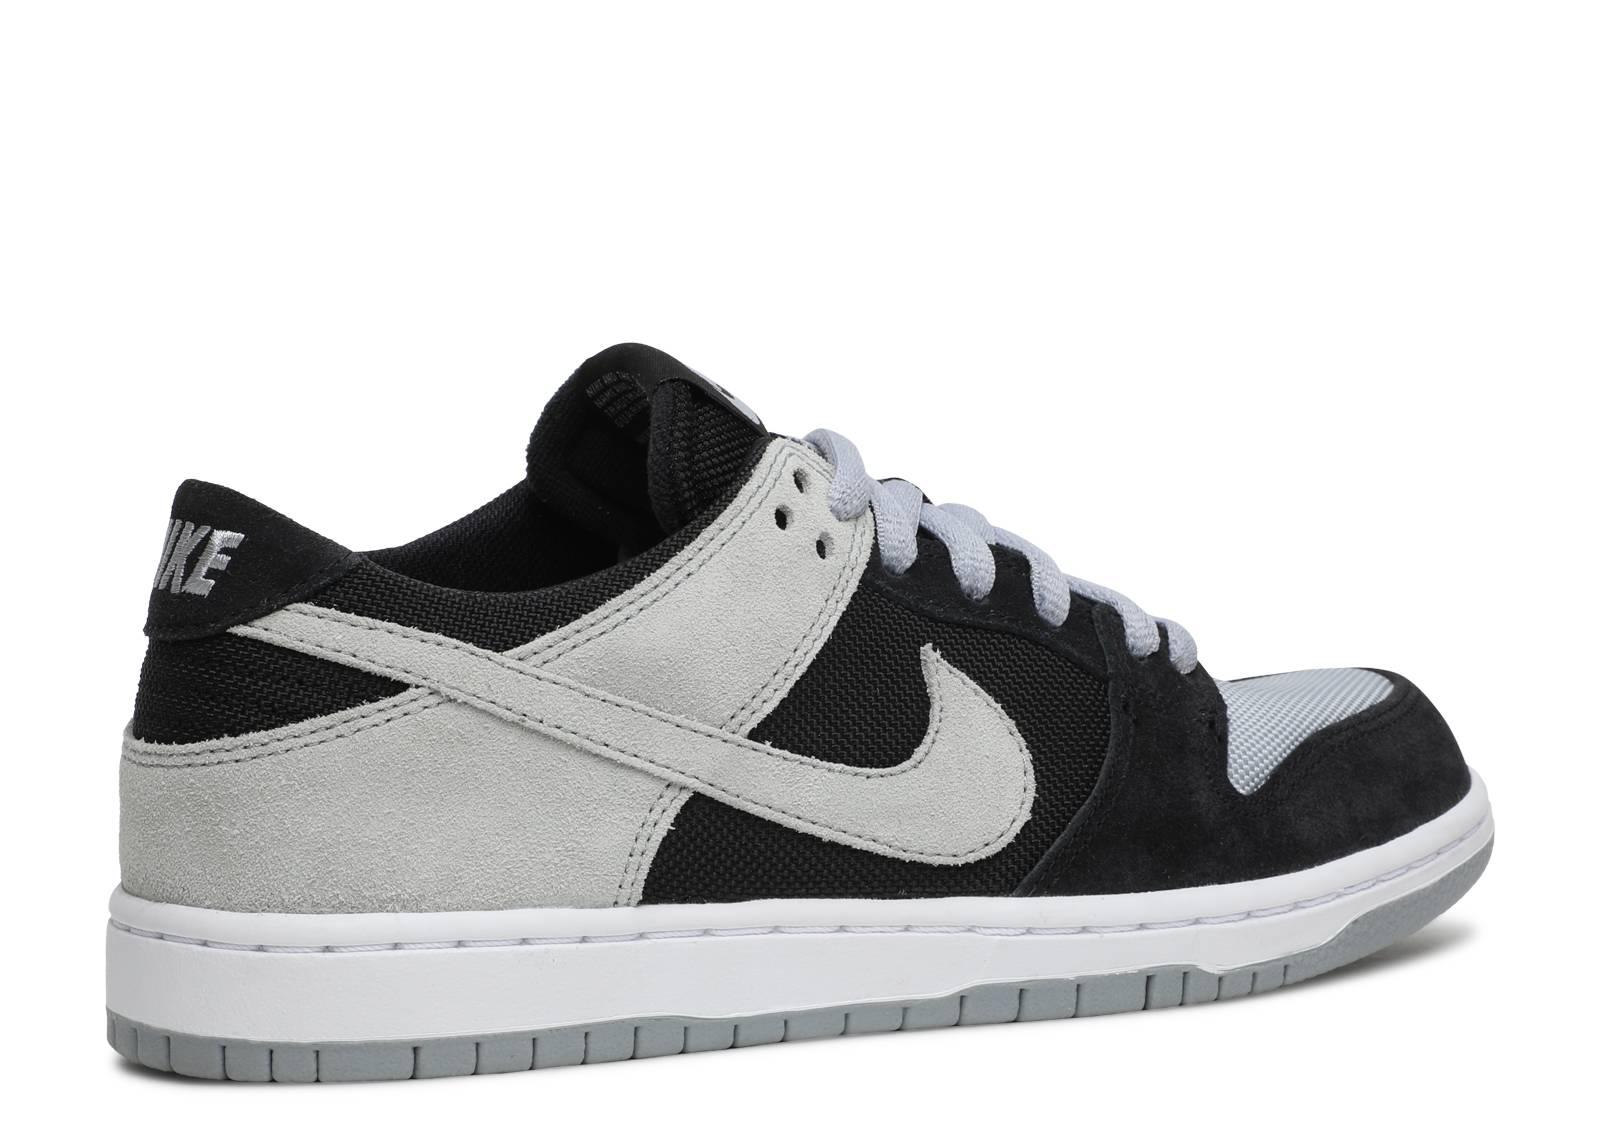 Nike Sb Zoom Dunk Low Pro - Nike - 854866 001 - black wolf grey ... 264daea2d6ea